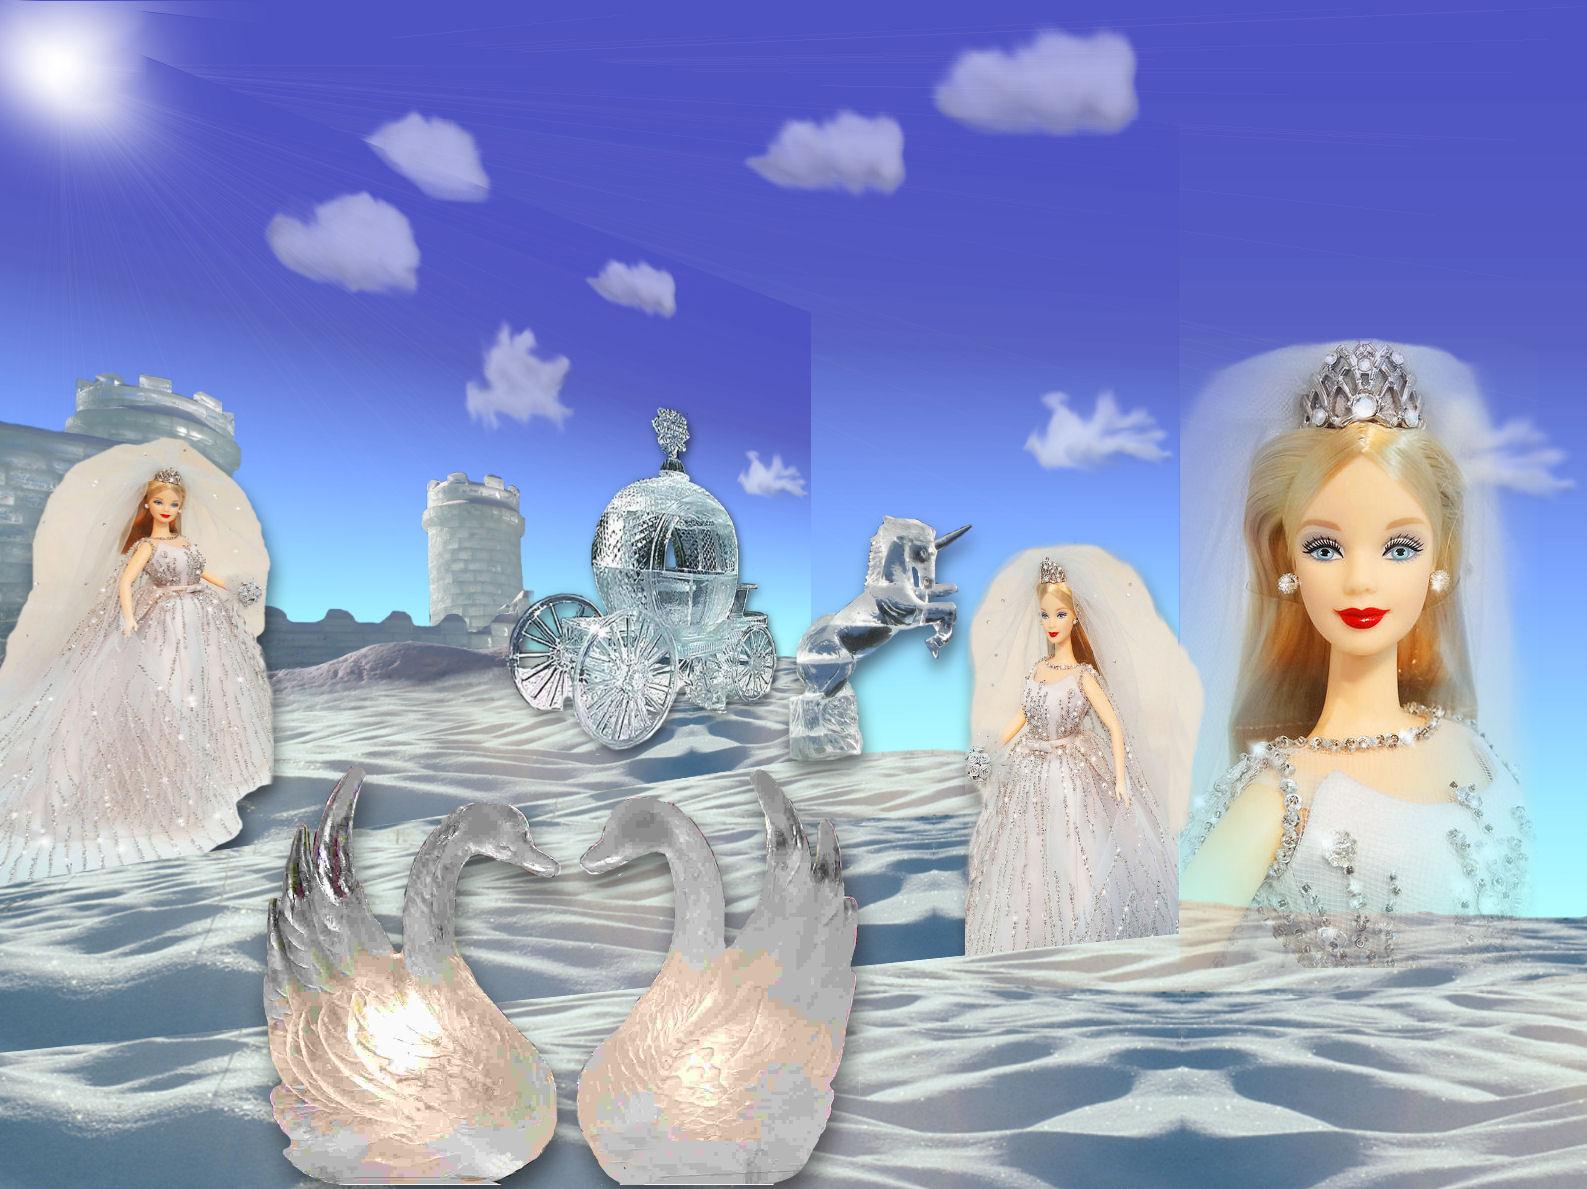 Barbie Pictures, Images & Photos | Photobucket